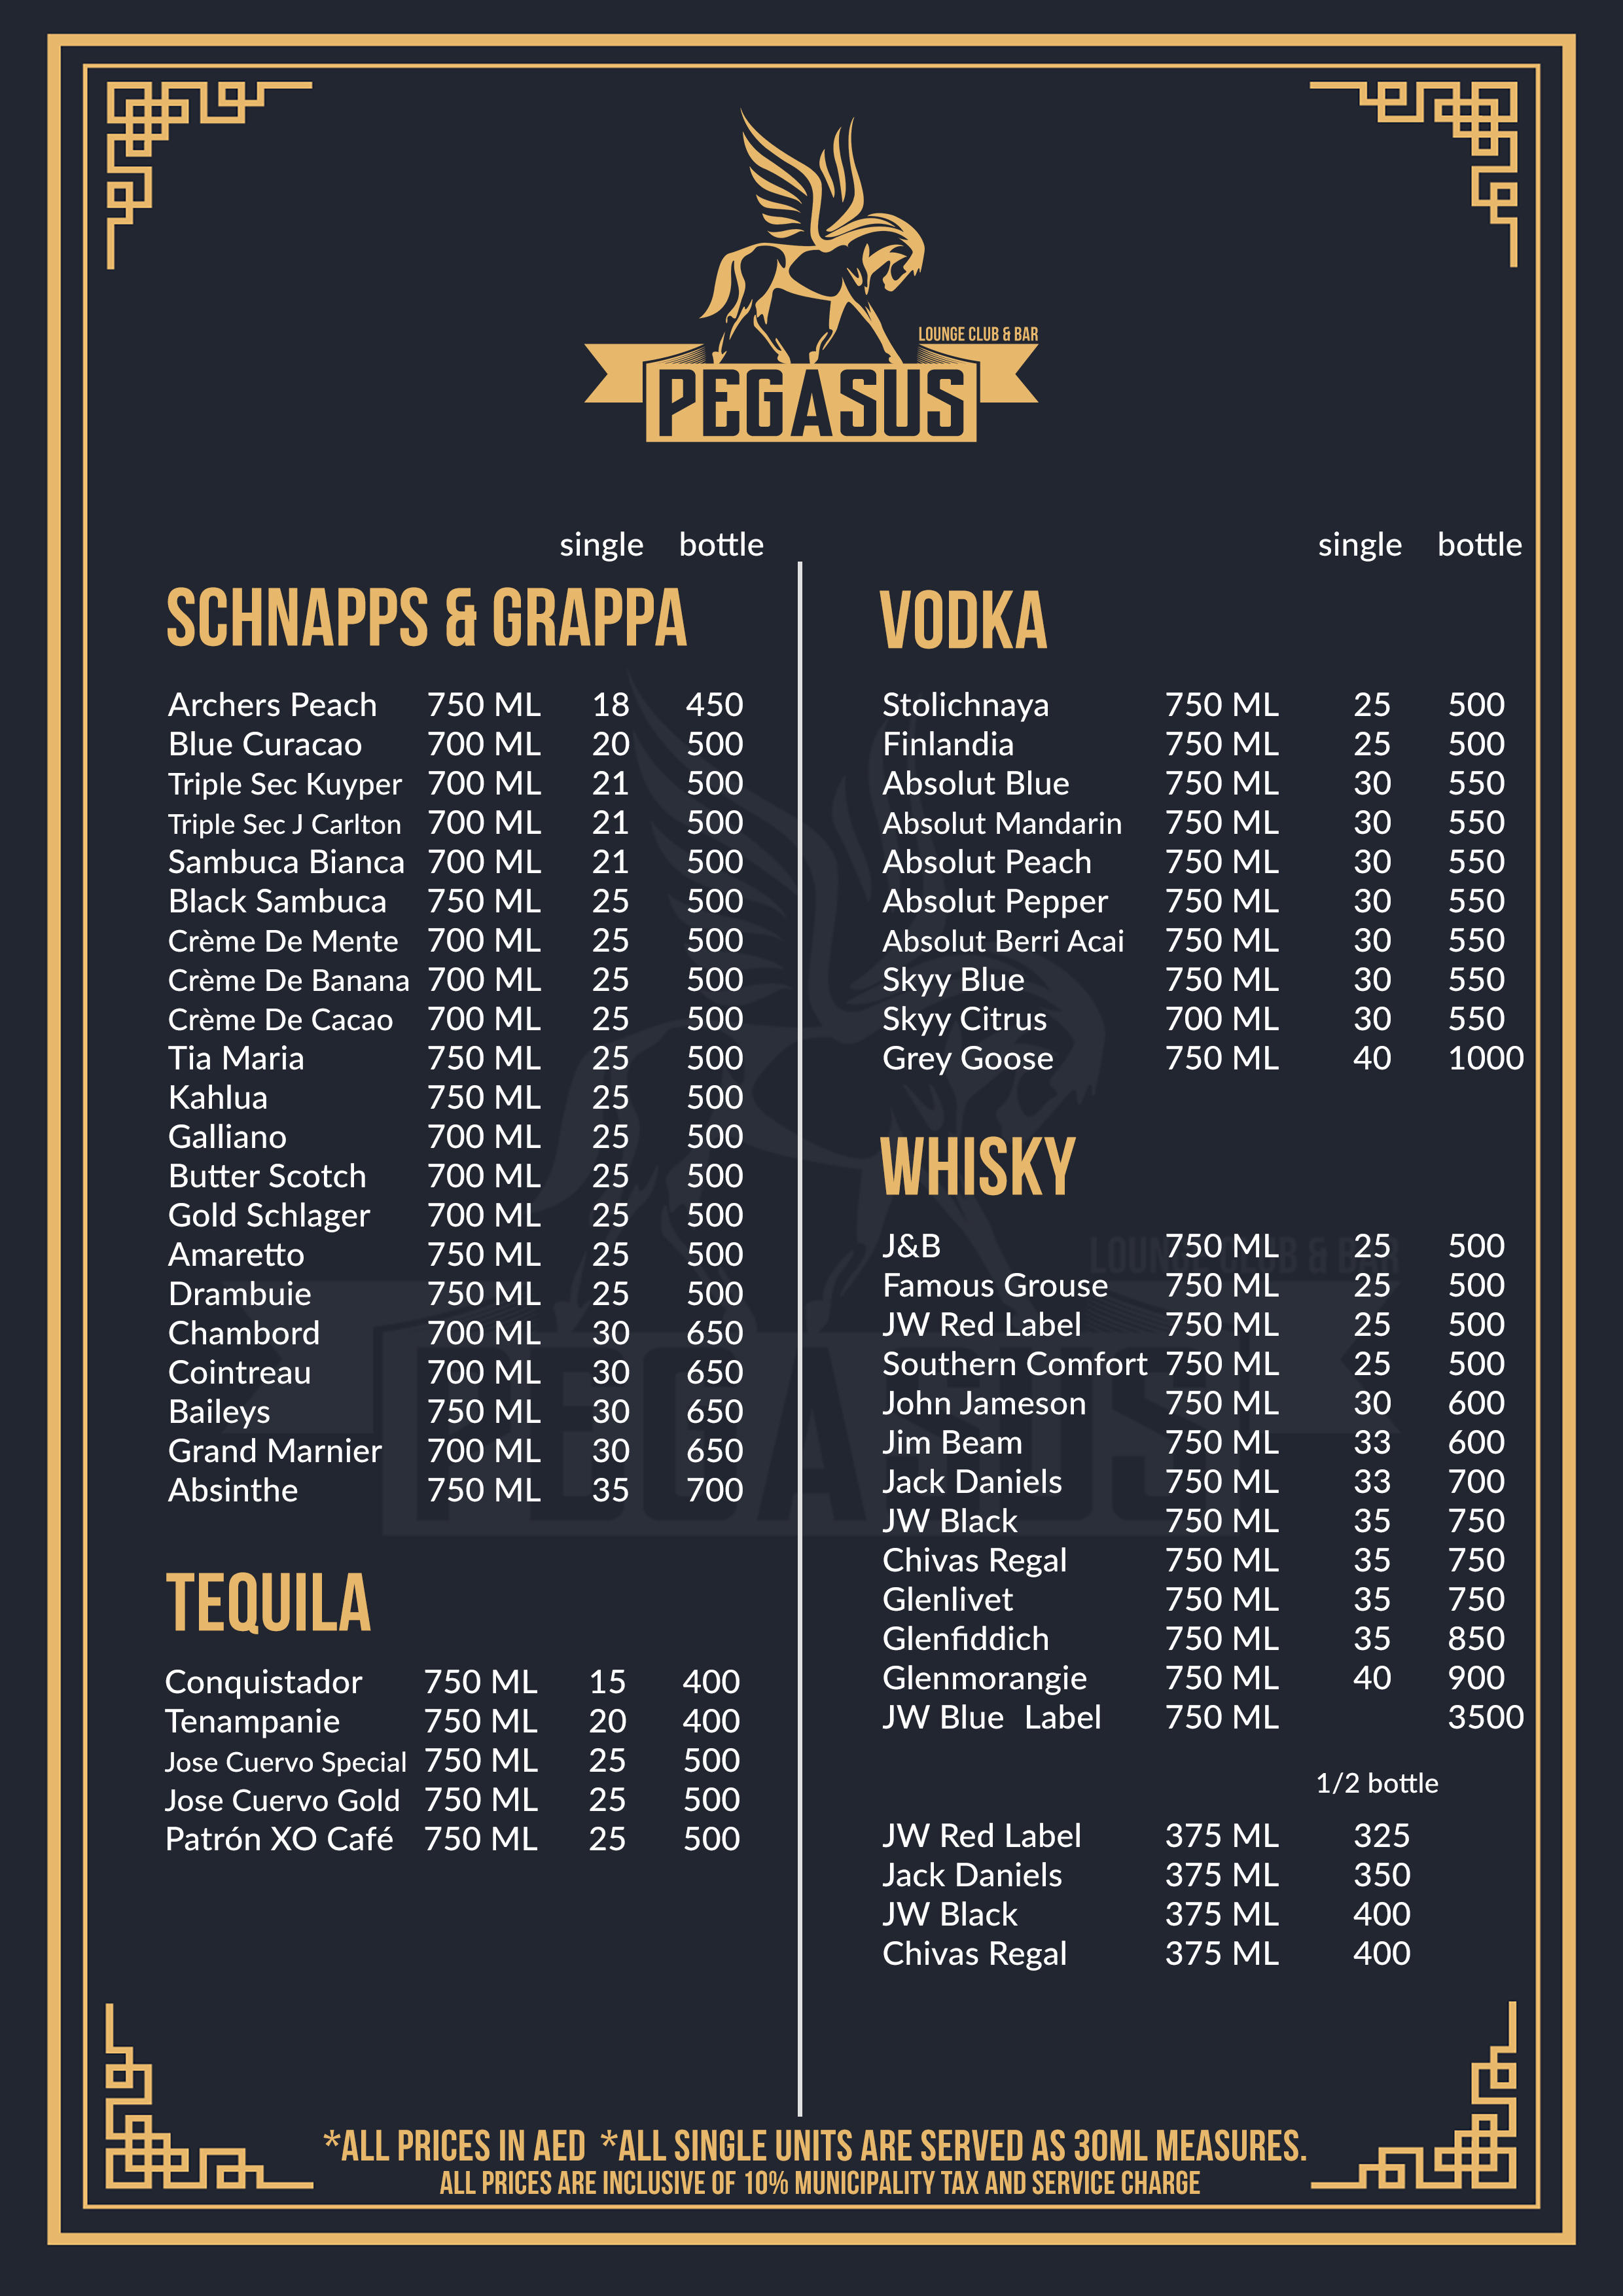 Pegasus Lounge Club Bar Menu11